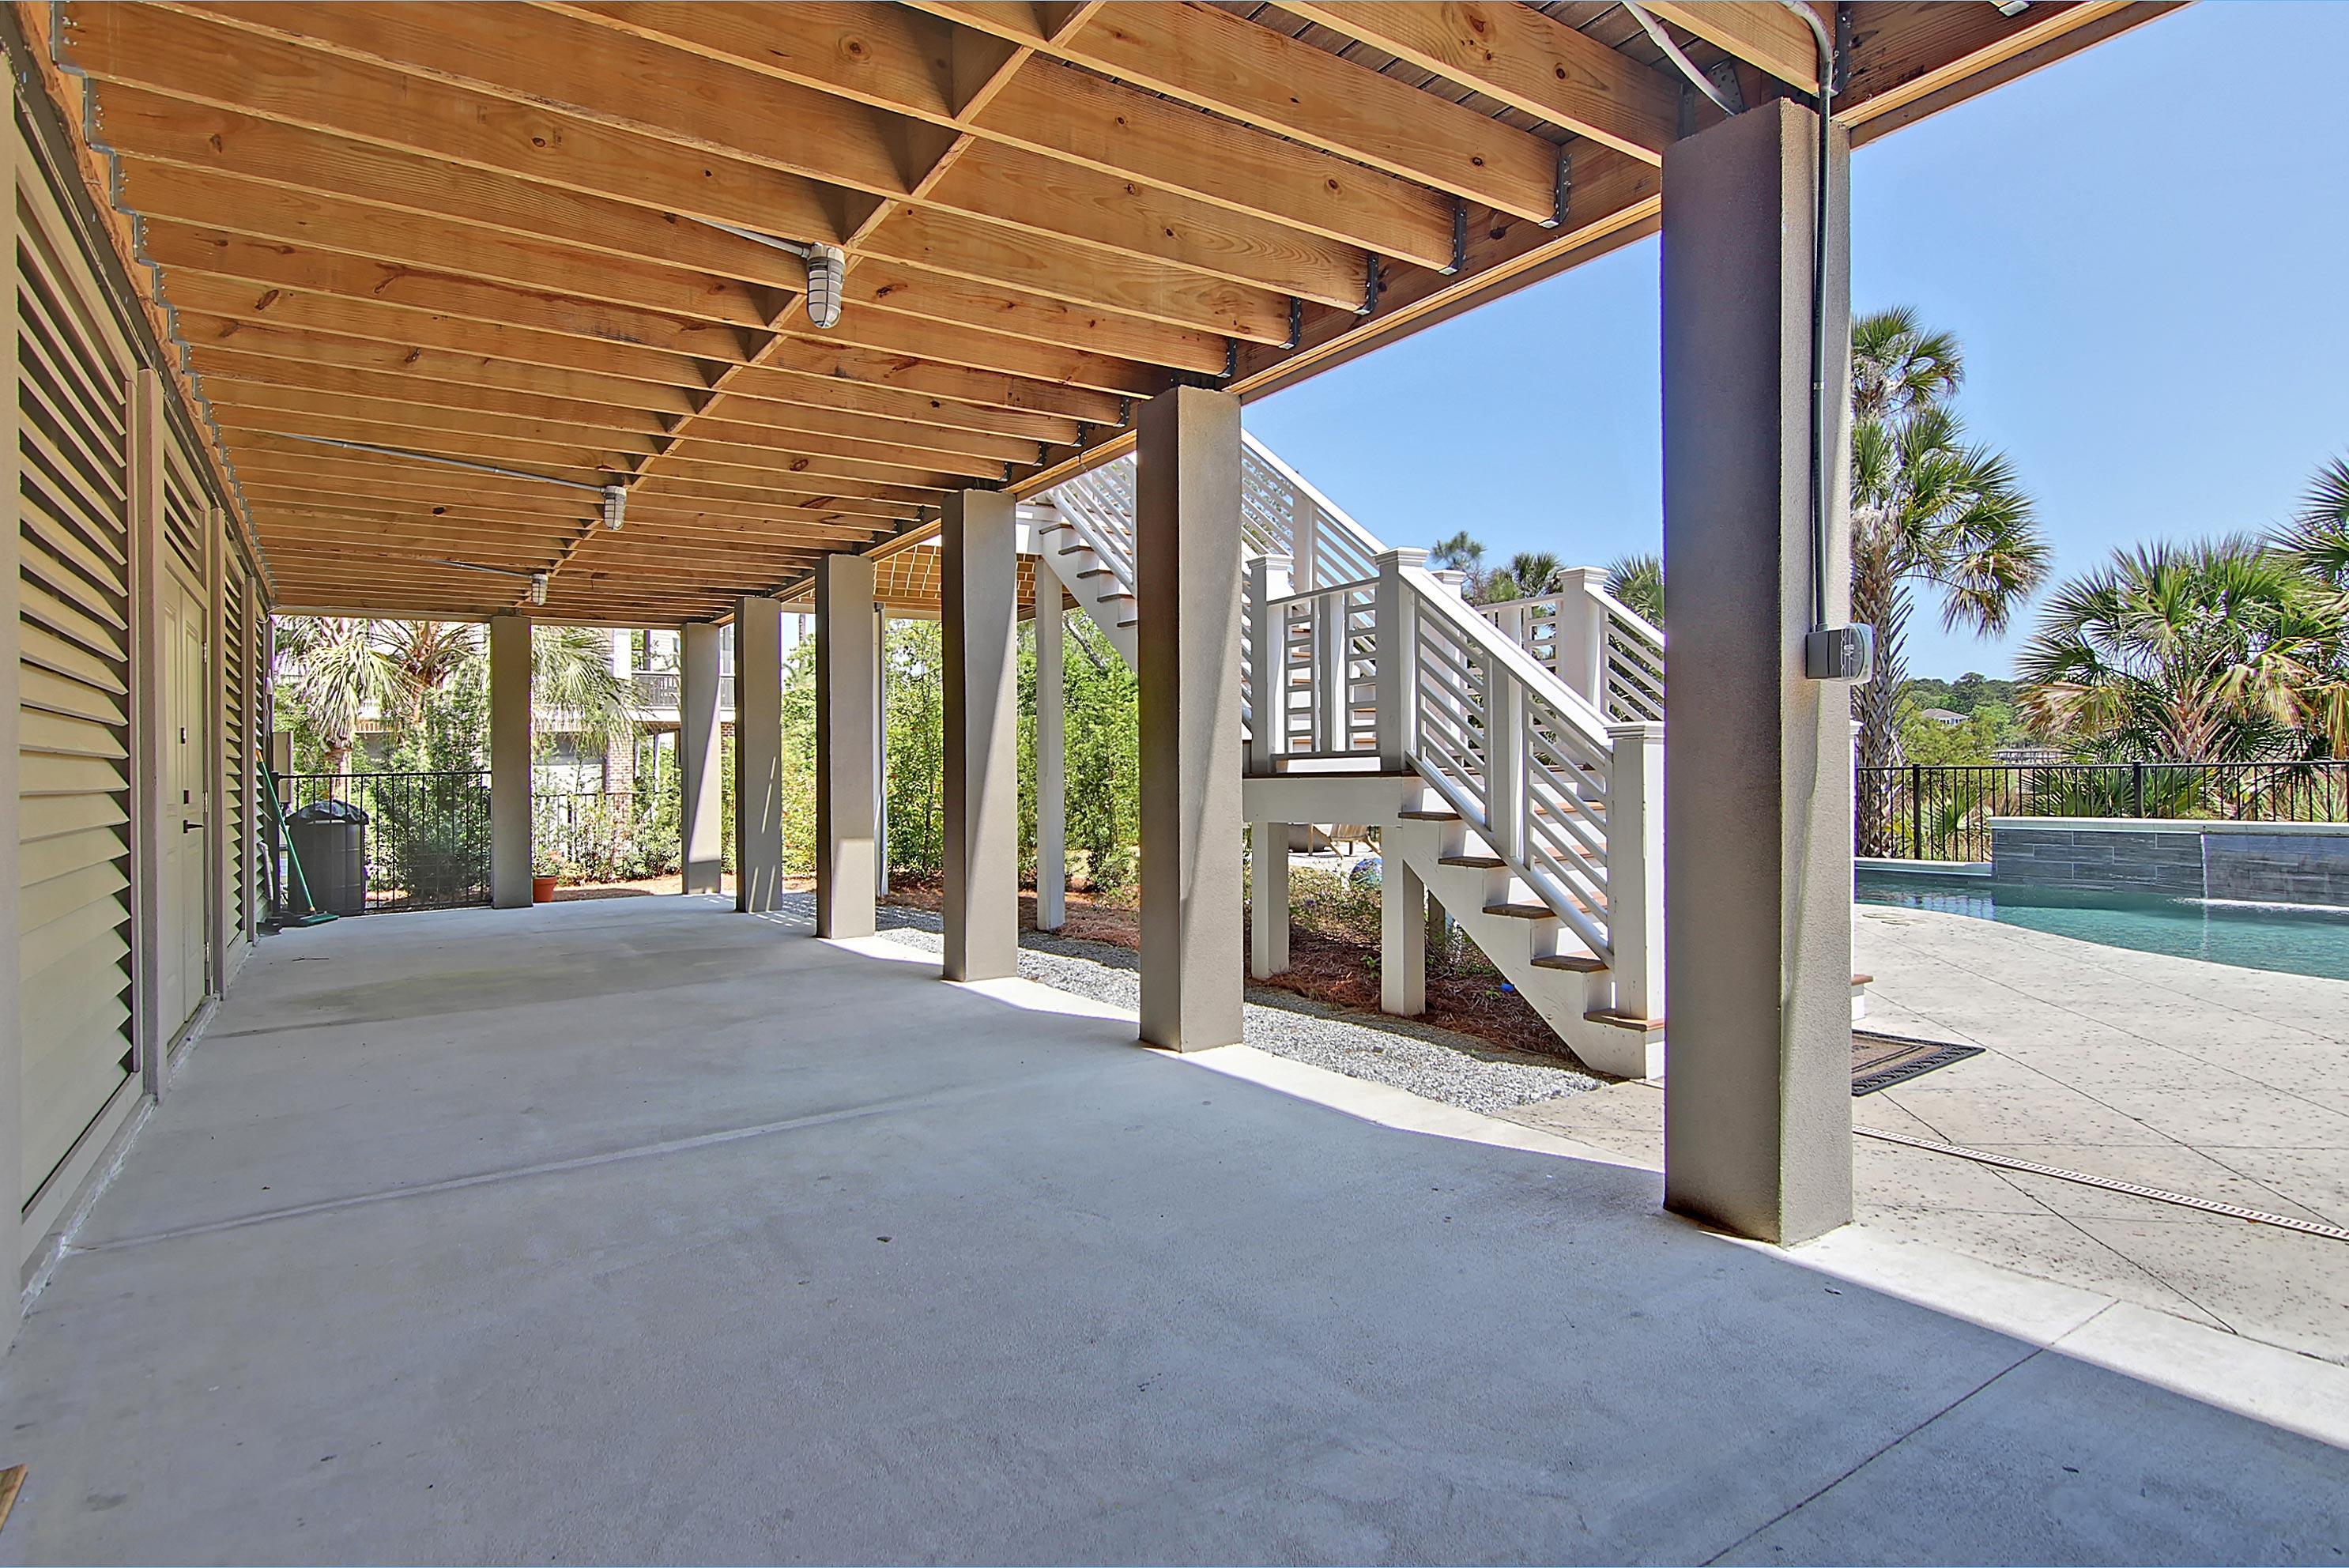 Dunes West Homes For Sale - 2456 Darts Cove, Mount Pleasant, SC - 35